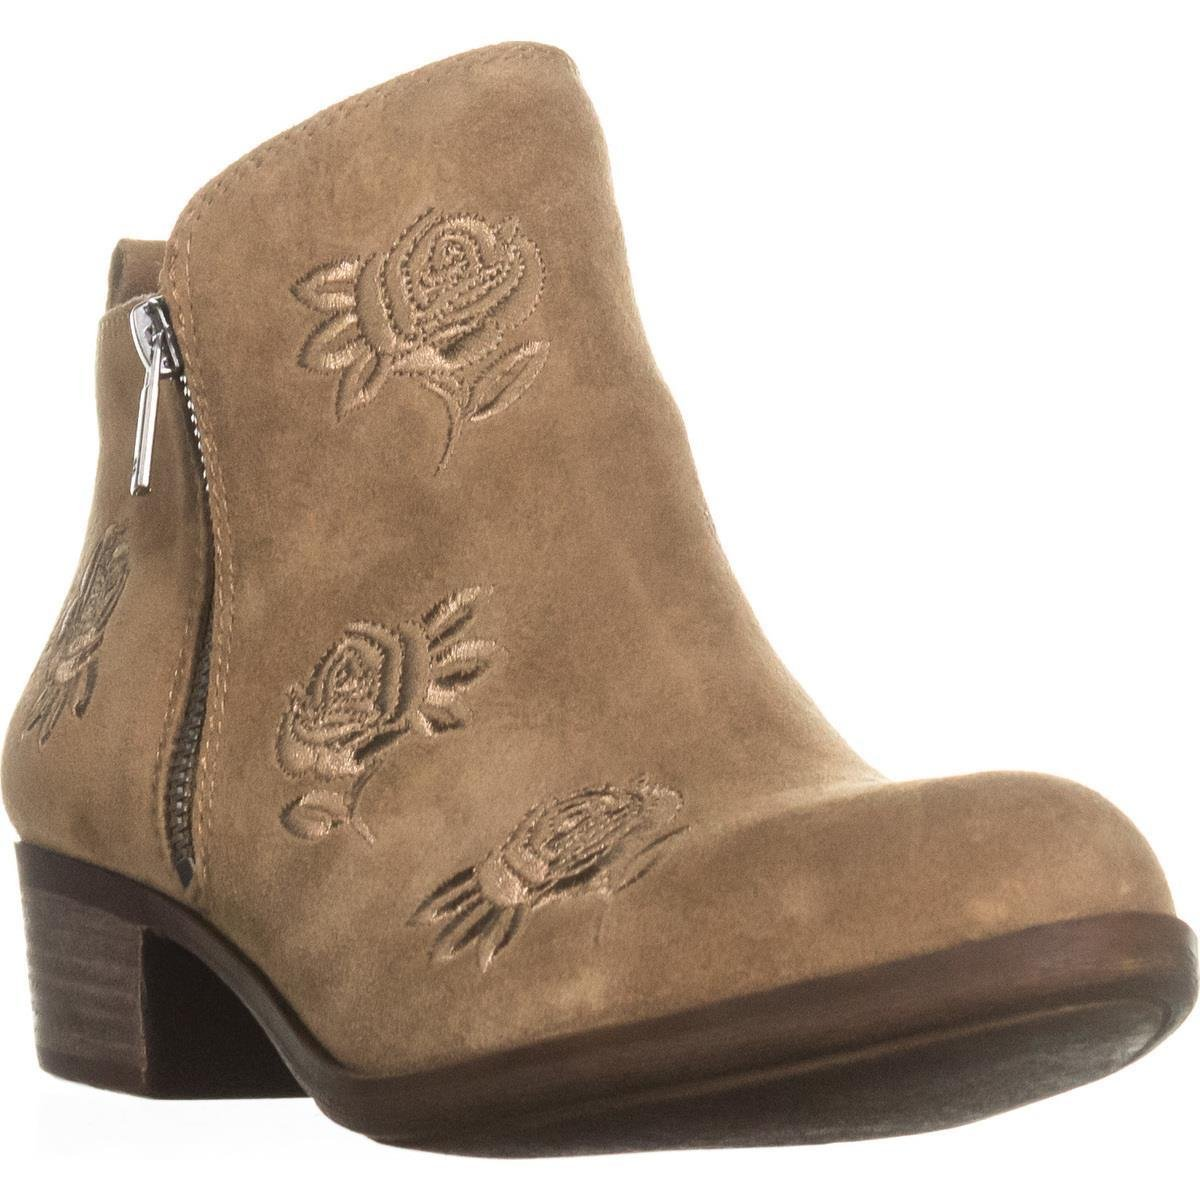 Lucky Brand Women's Basel Boot B076PY2VLB 9.5 B(M) US|Sesame 241